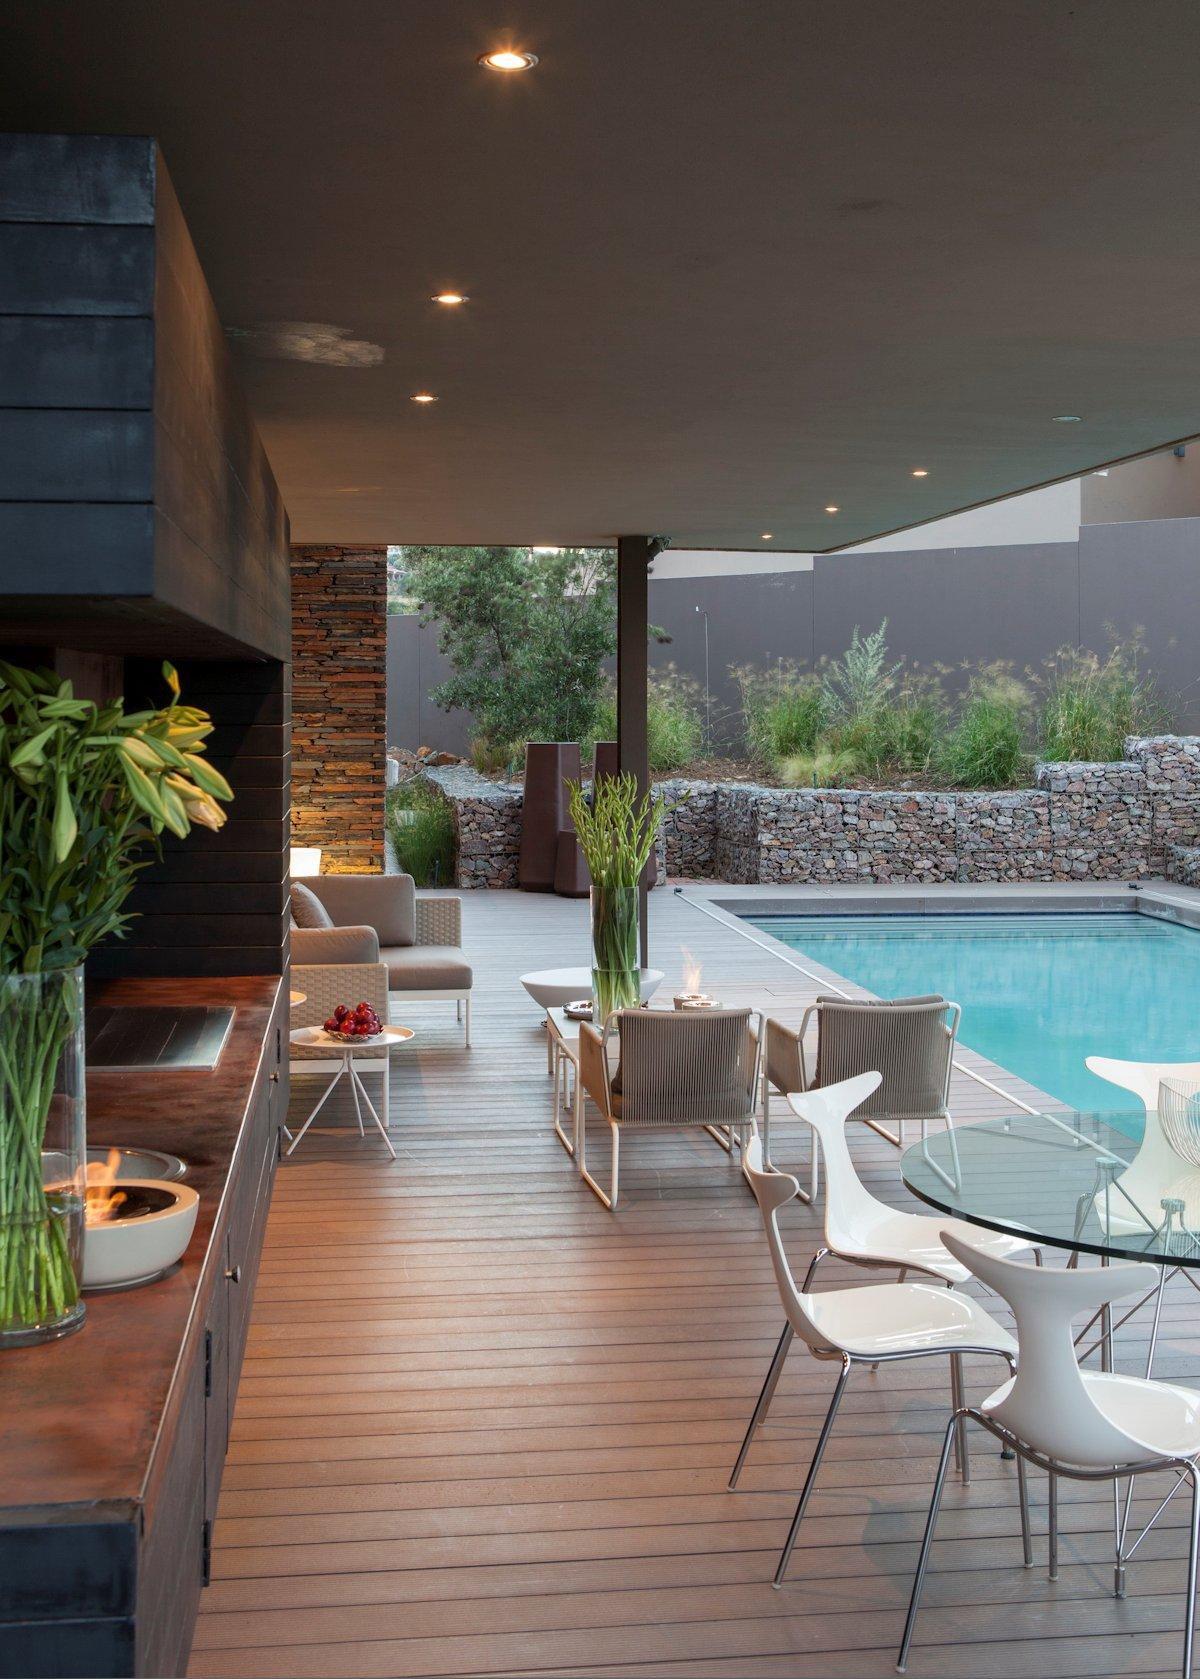 Wood Decking, Furniture, Pool, House in Johannesburg